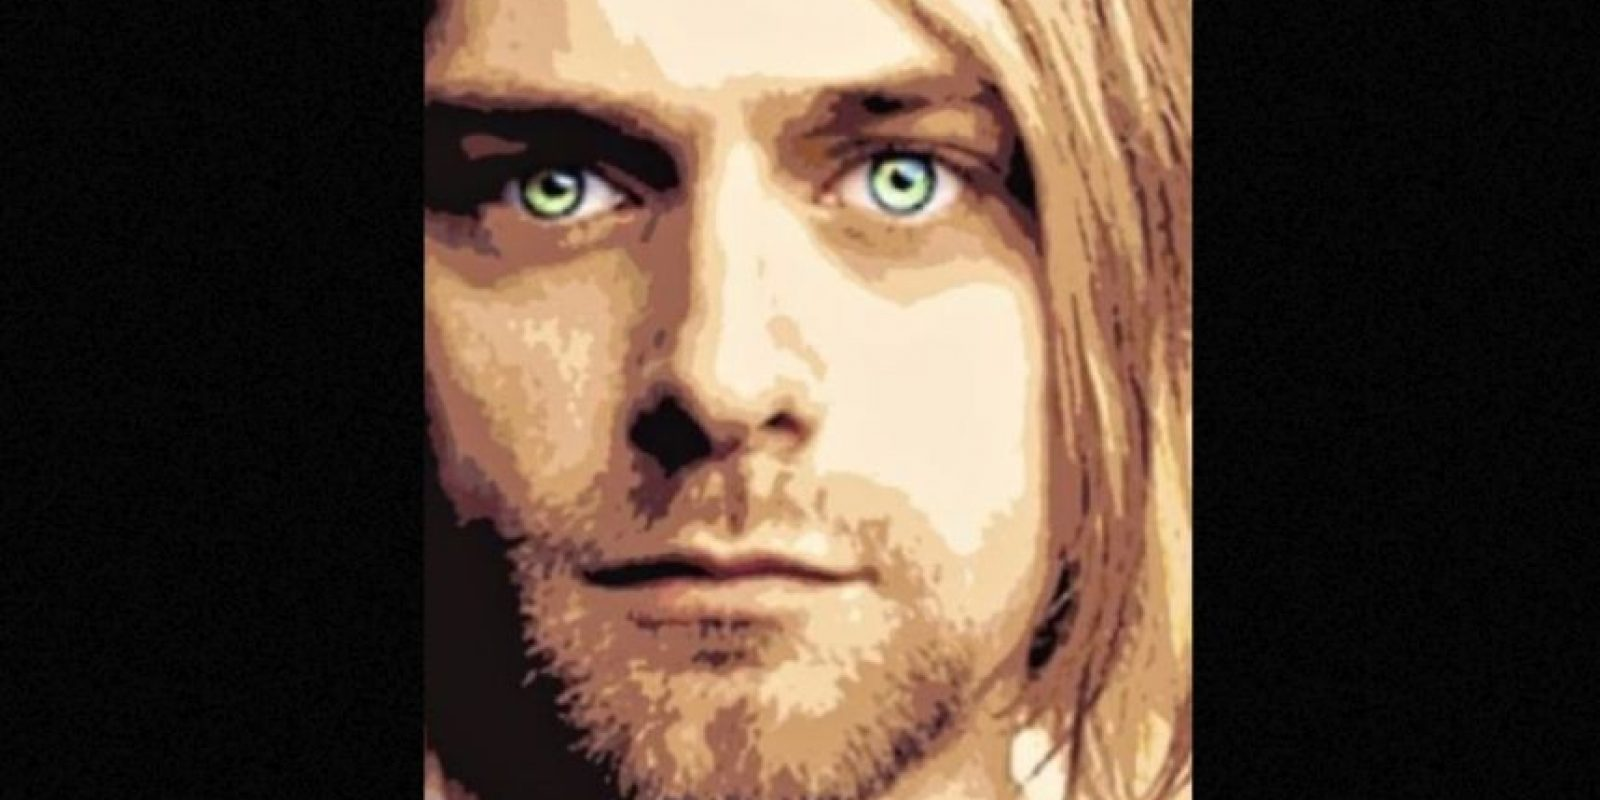 También las de Kurt Cobain Foto:Deviantart